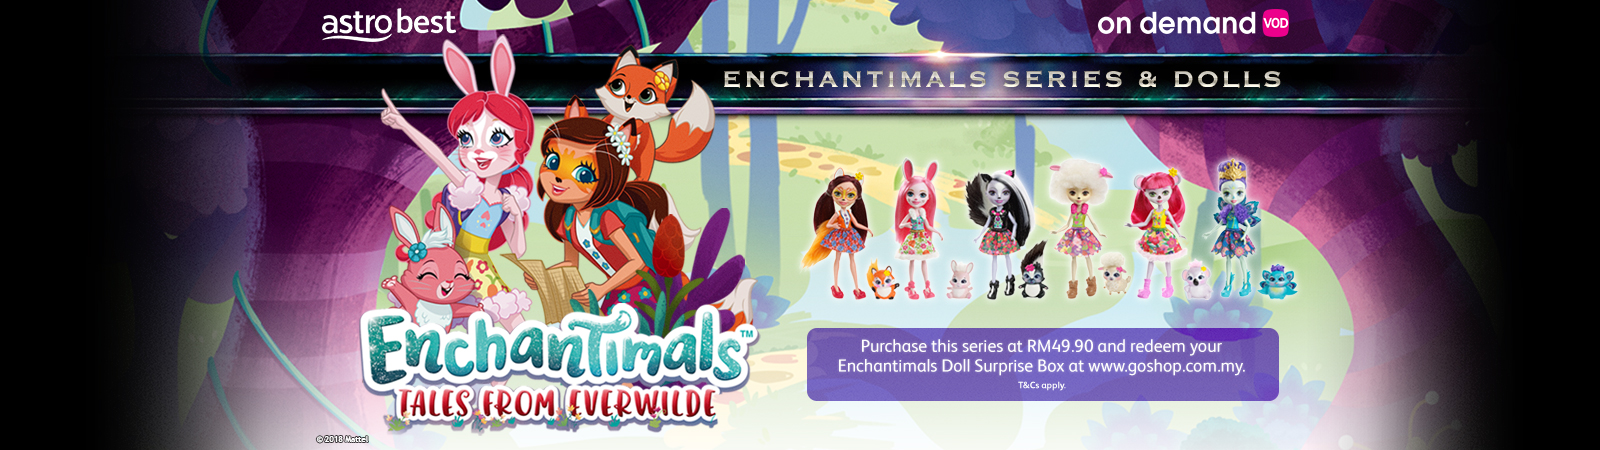 Enchantimals Series & Dolls